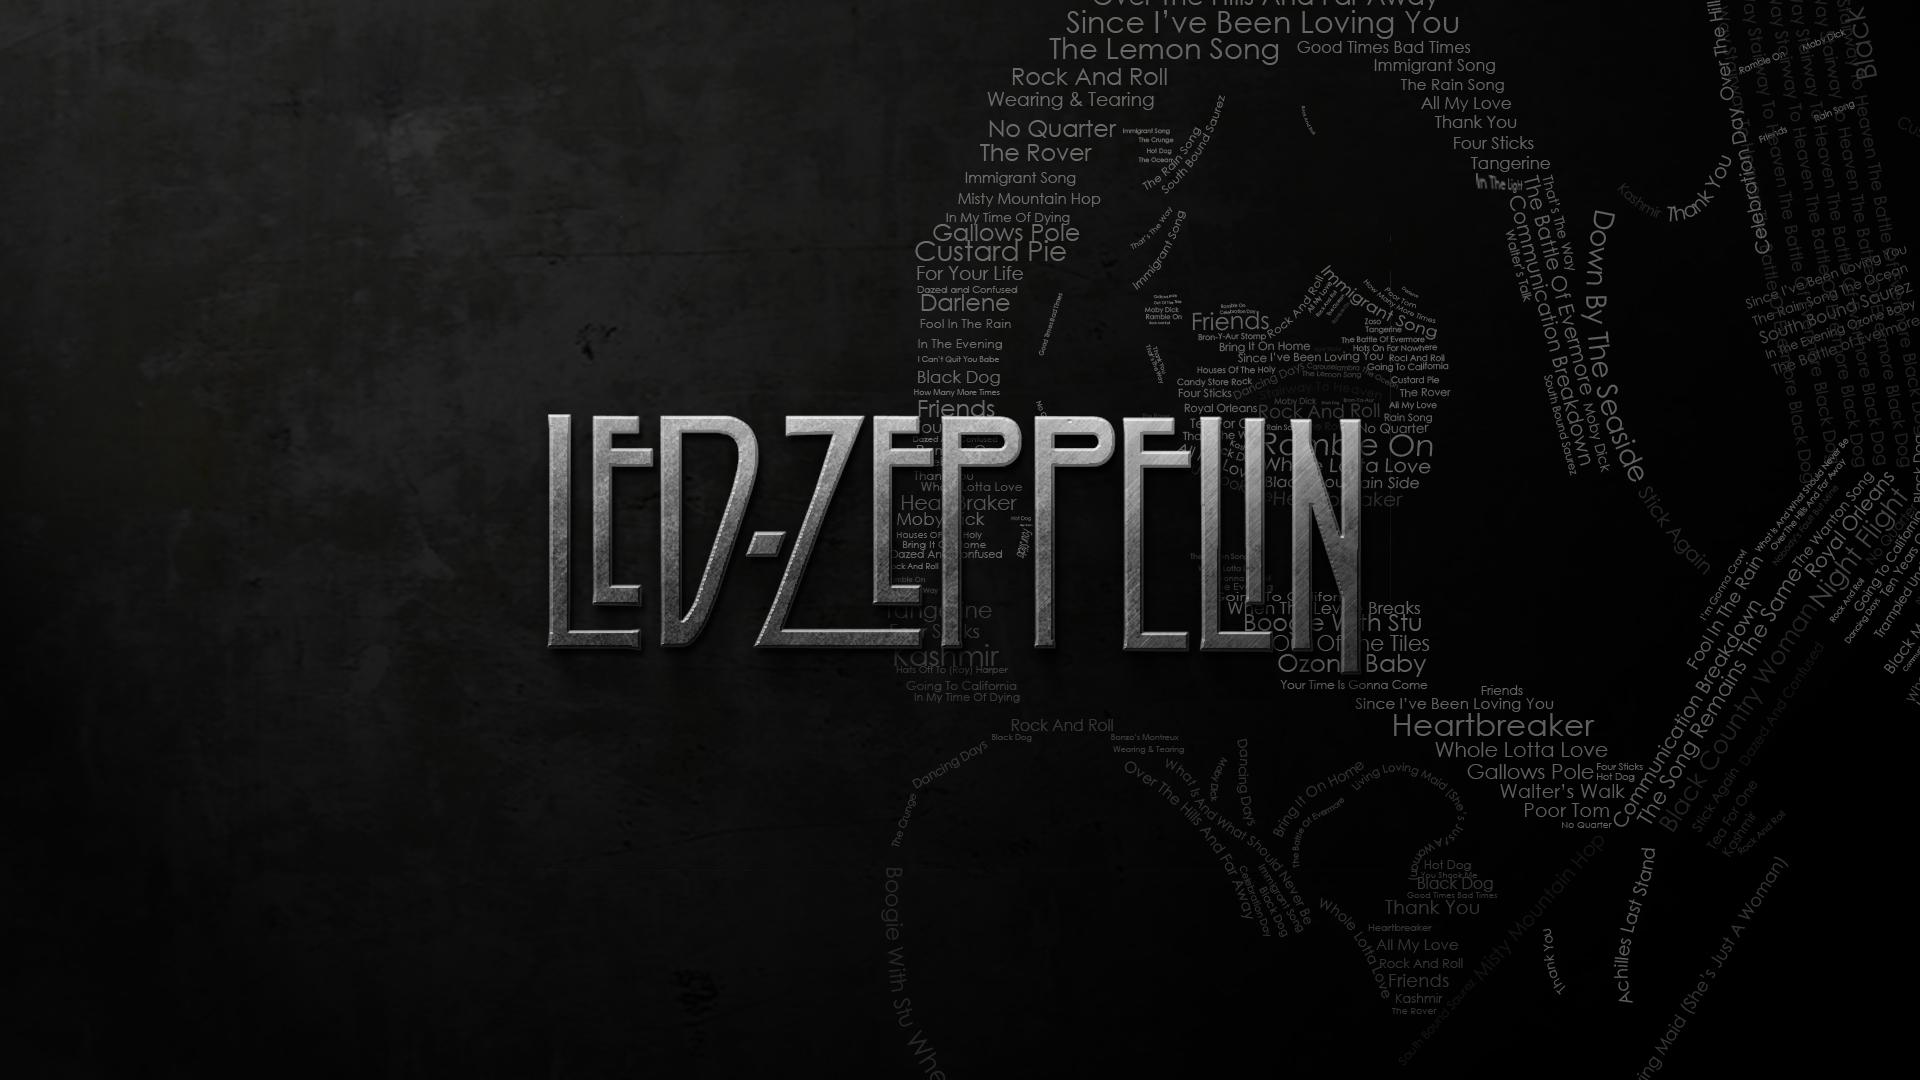 Led Zeppelin Wallpaper 1920x1200 - WallpaperSafari